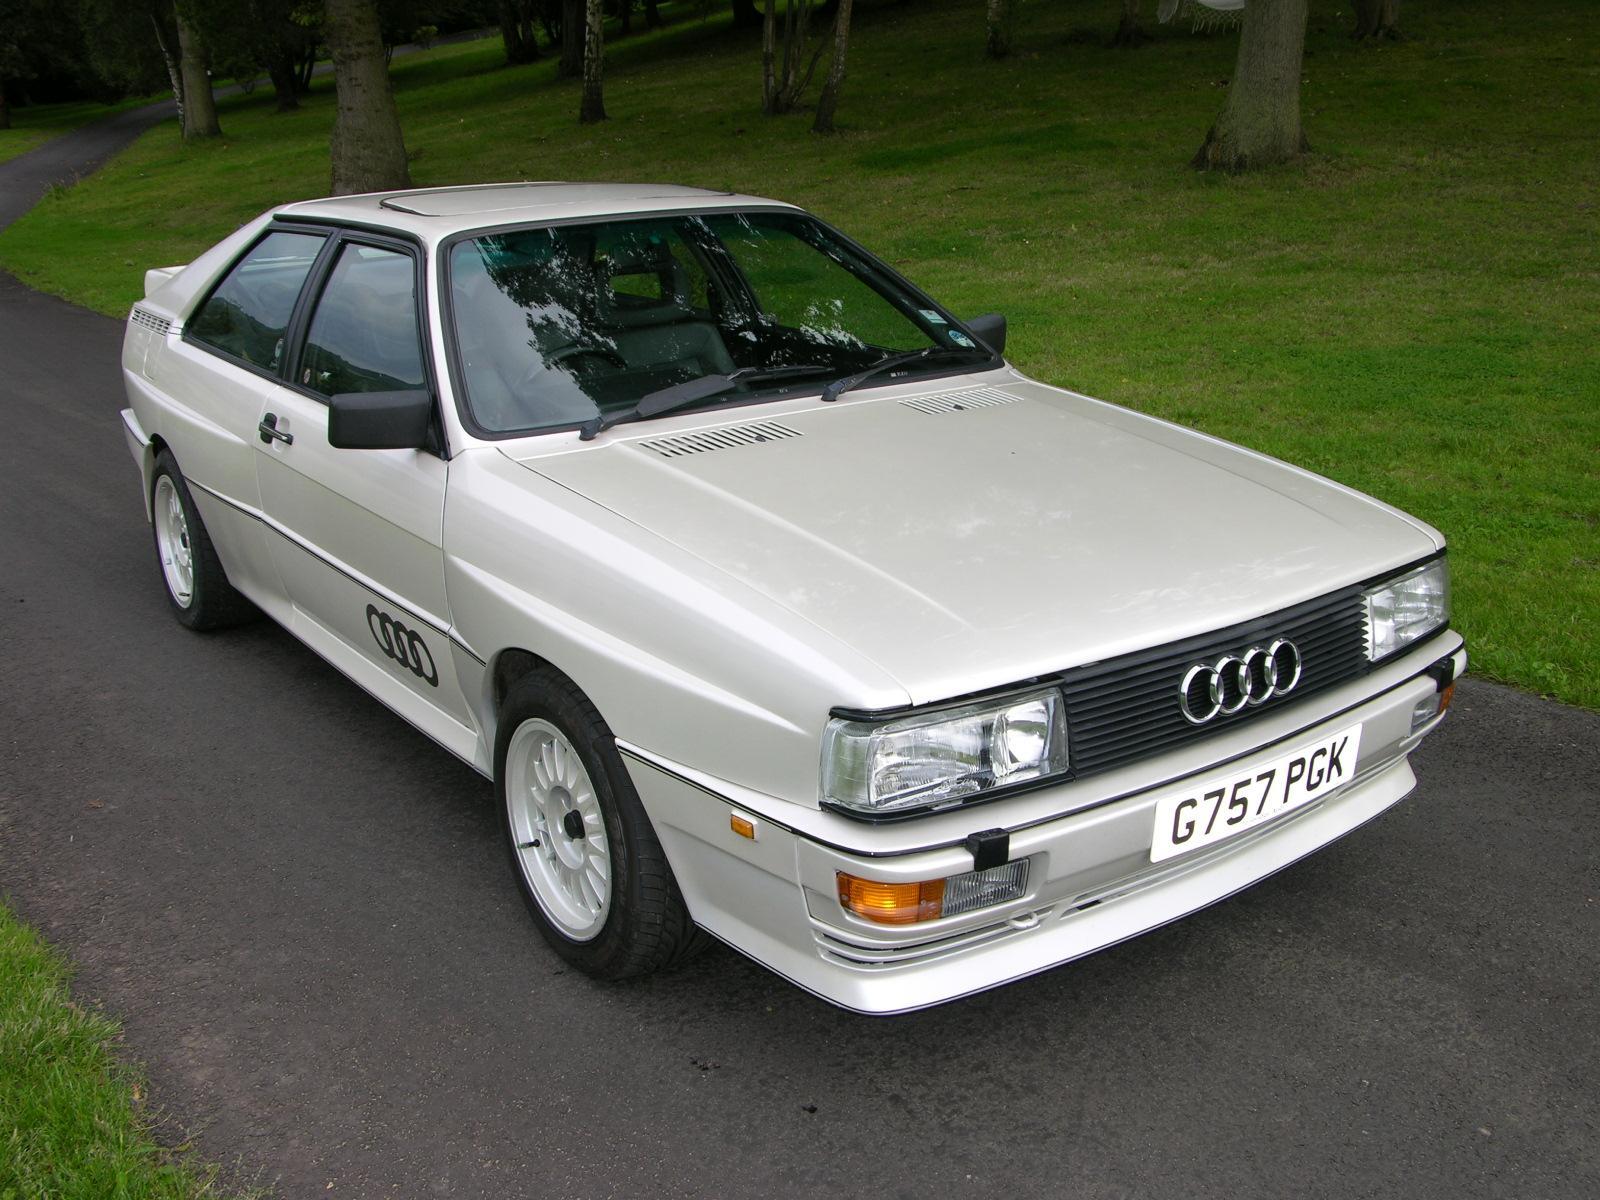 FileAudi Quattro V Jpg Wikimedia Commons - Audi quattro